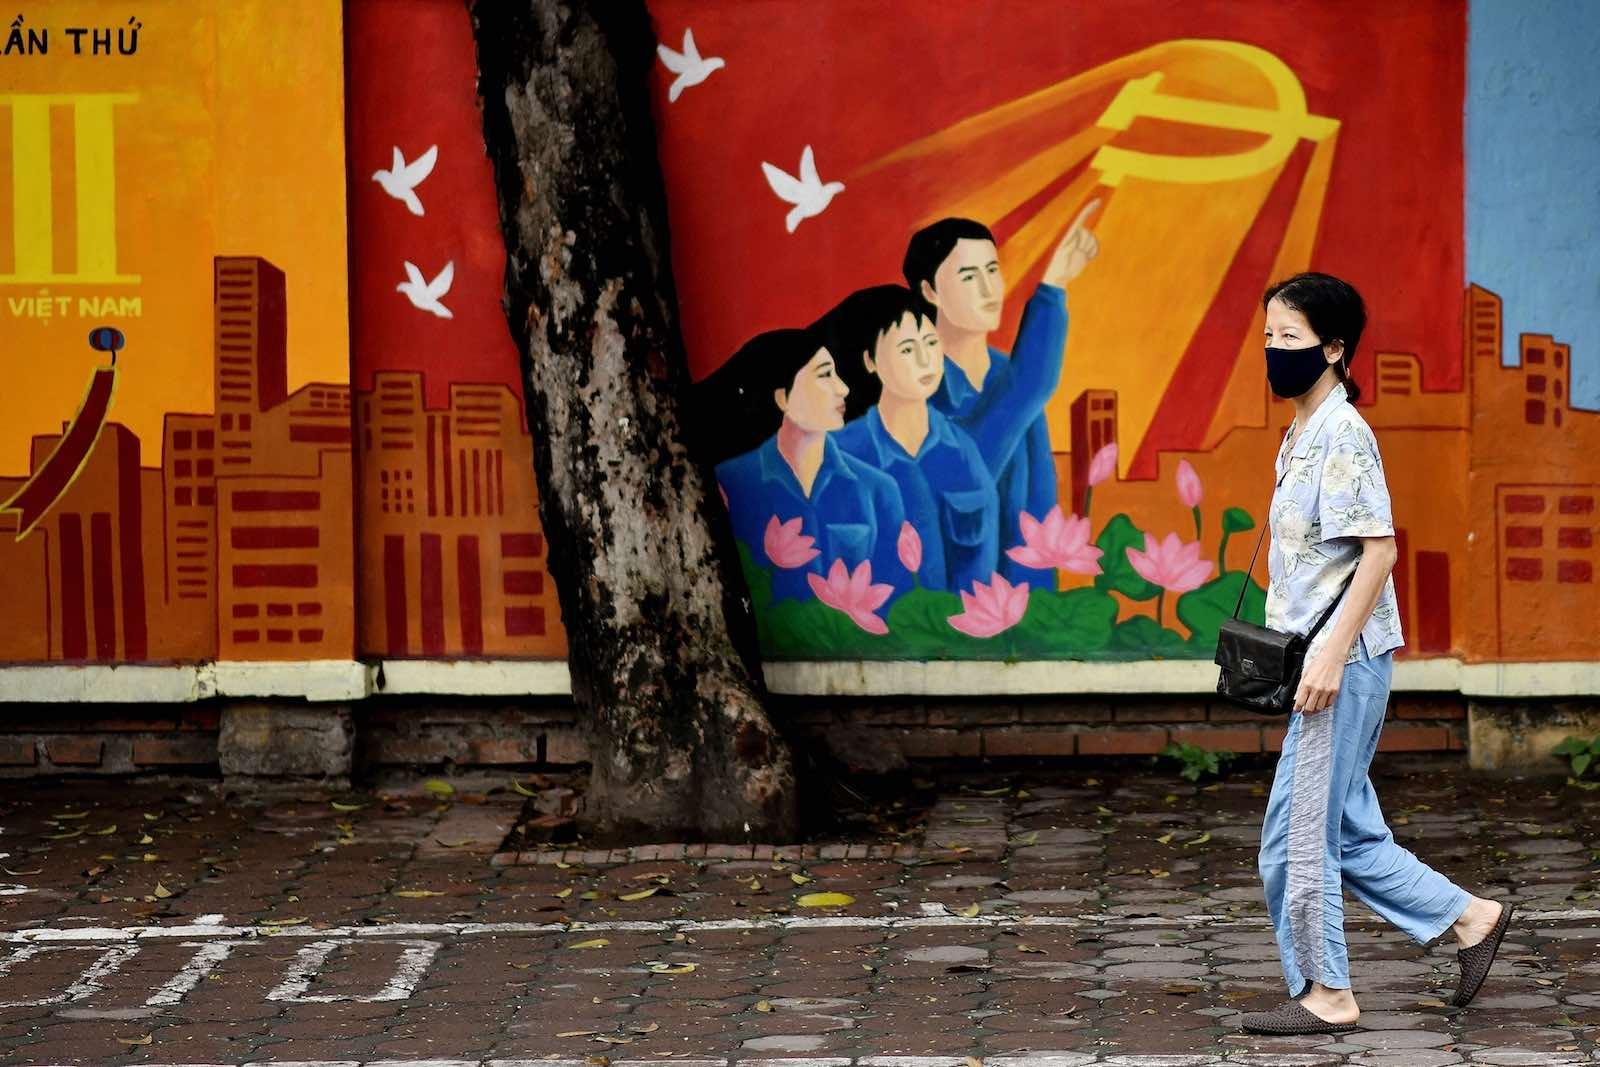 Hanoi, Vietnam, 8 April (Manan Vatsyayana/AFP/Getty Images)